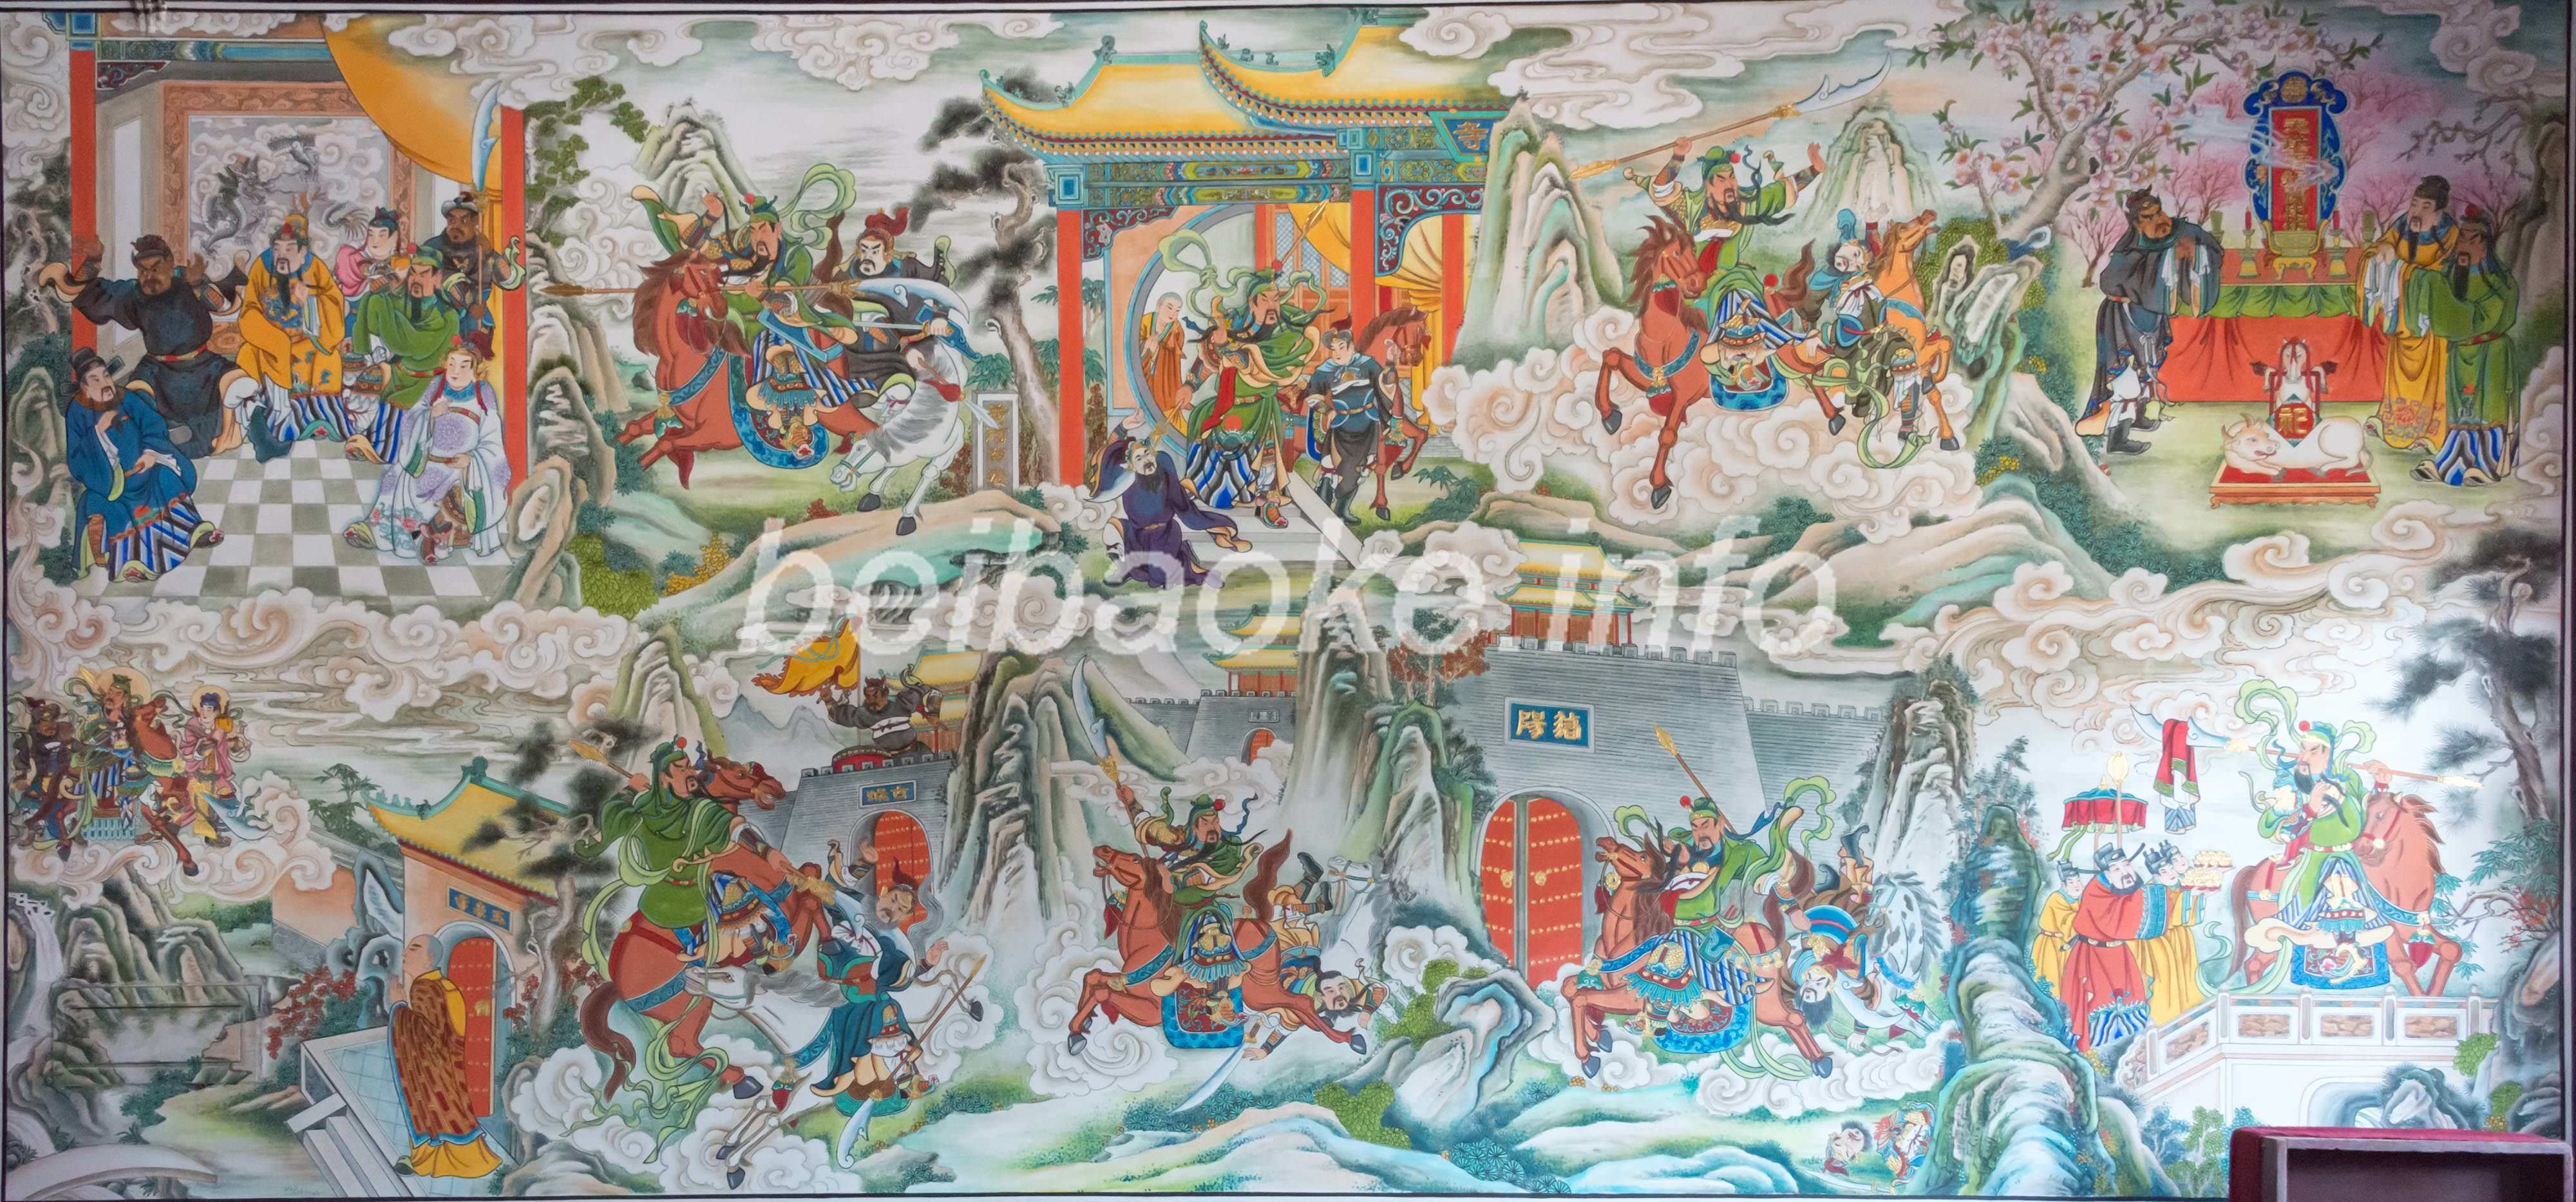 関羽関連の壁画